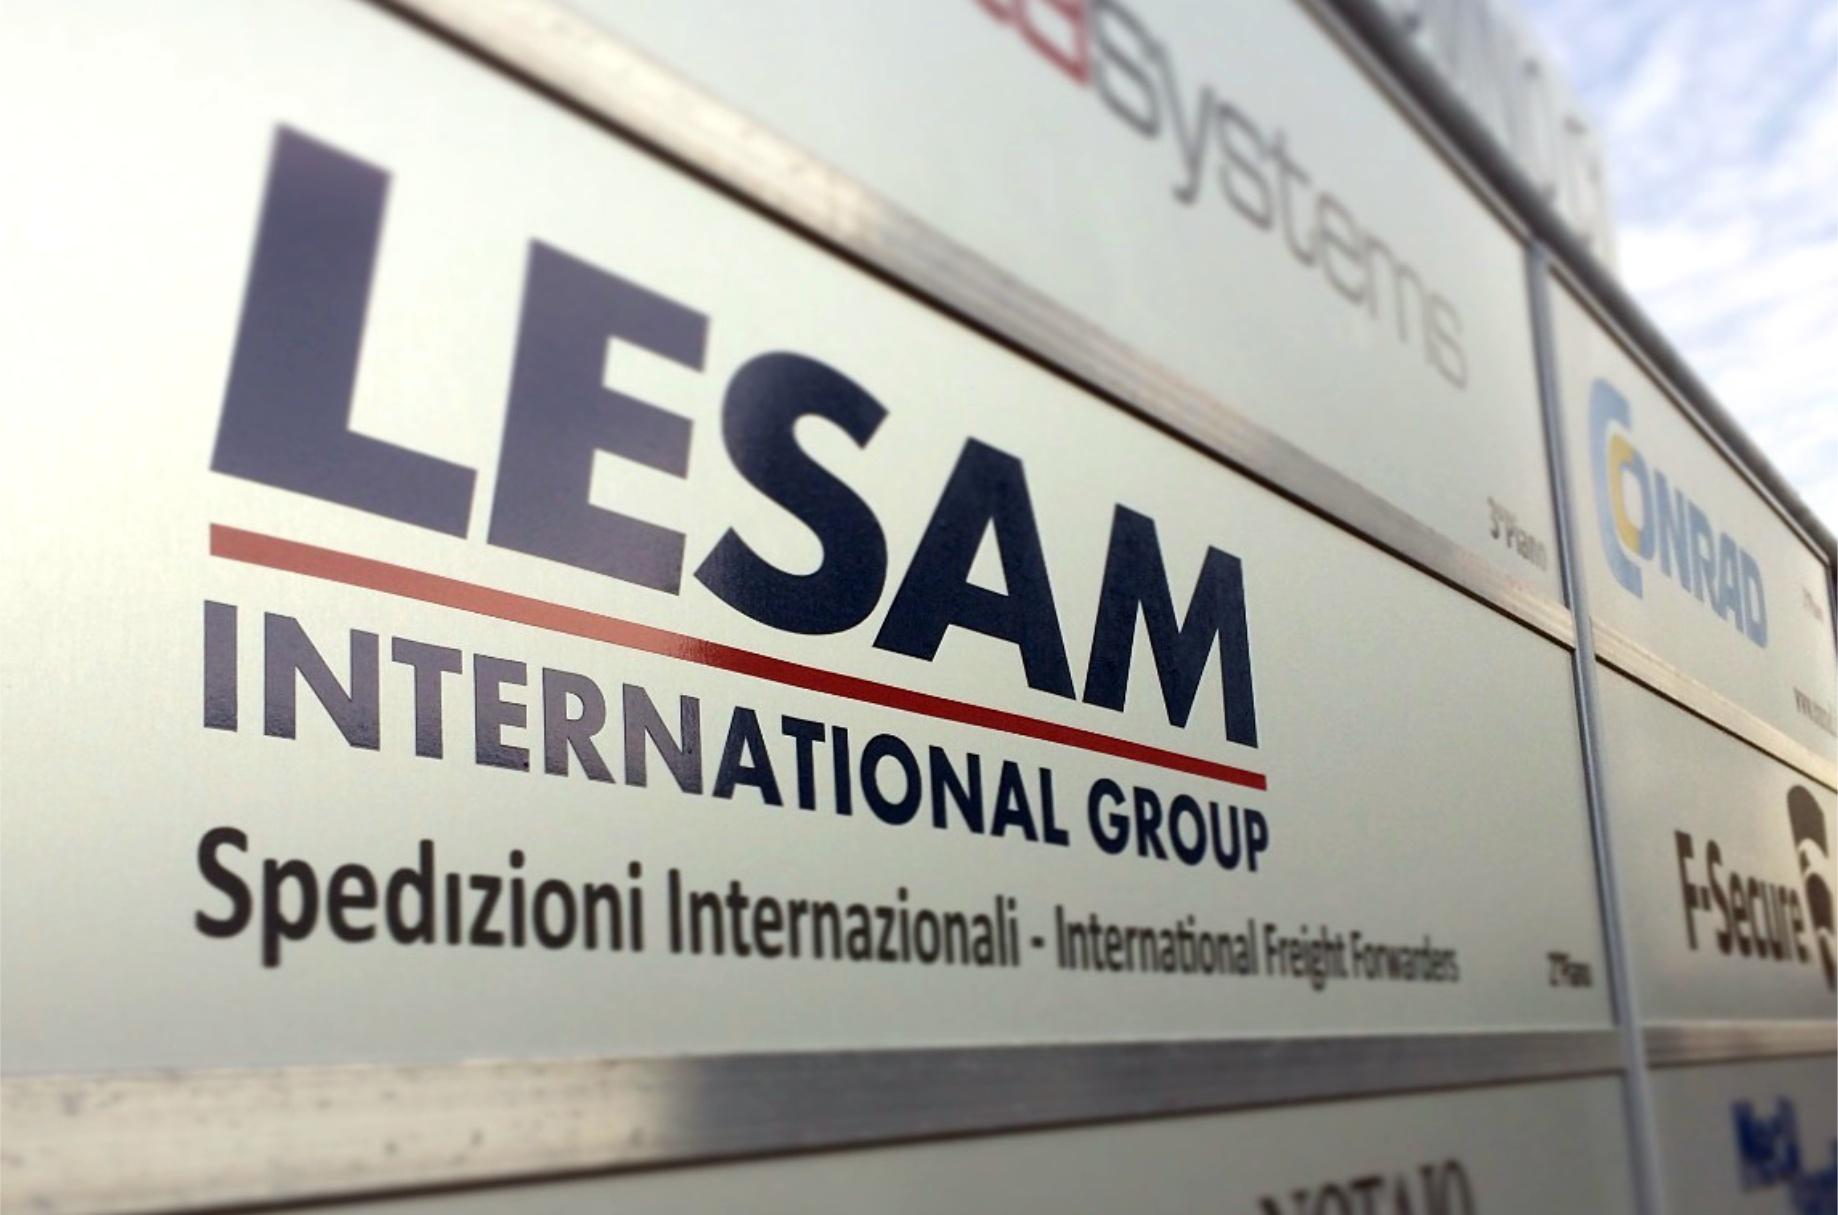 LESAM INTERNATIONAL targa adesivo